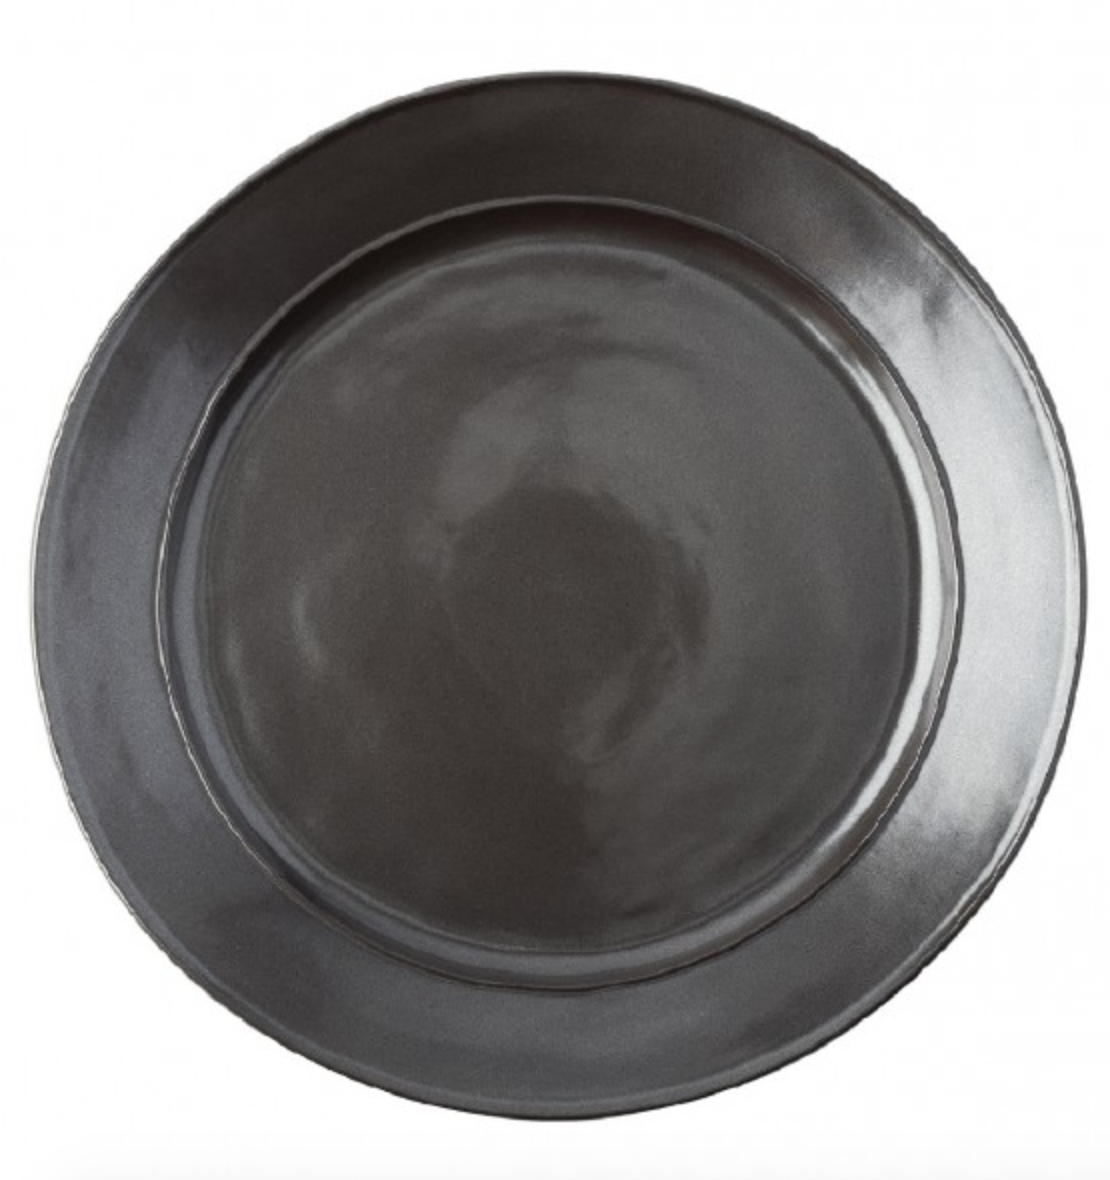 "Pewter Round Dinner Plate 11"" #KP01/91"